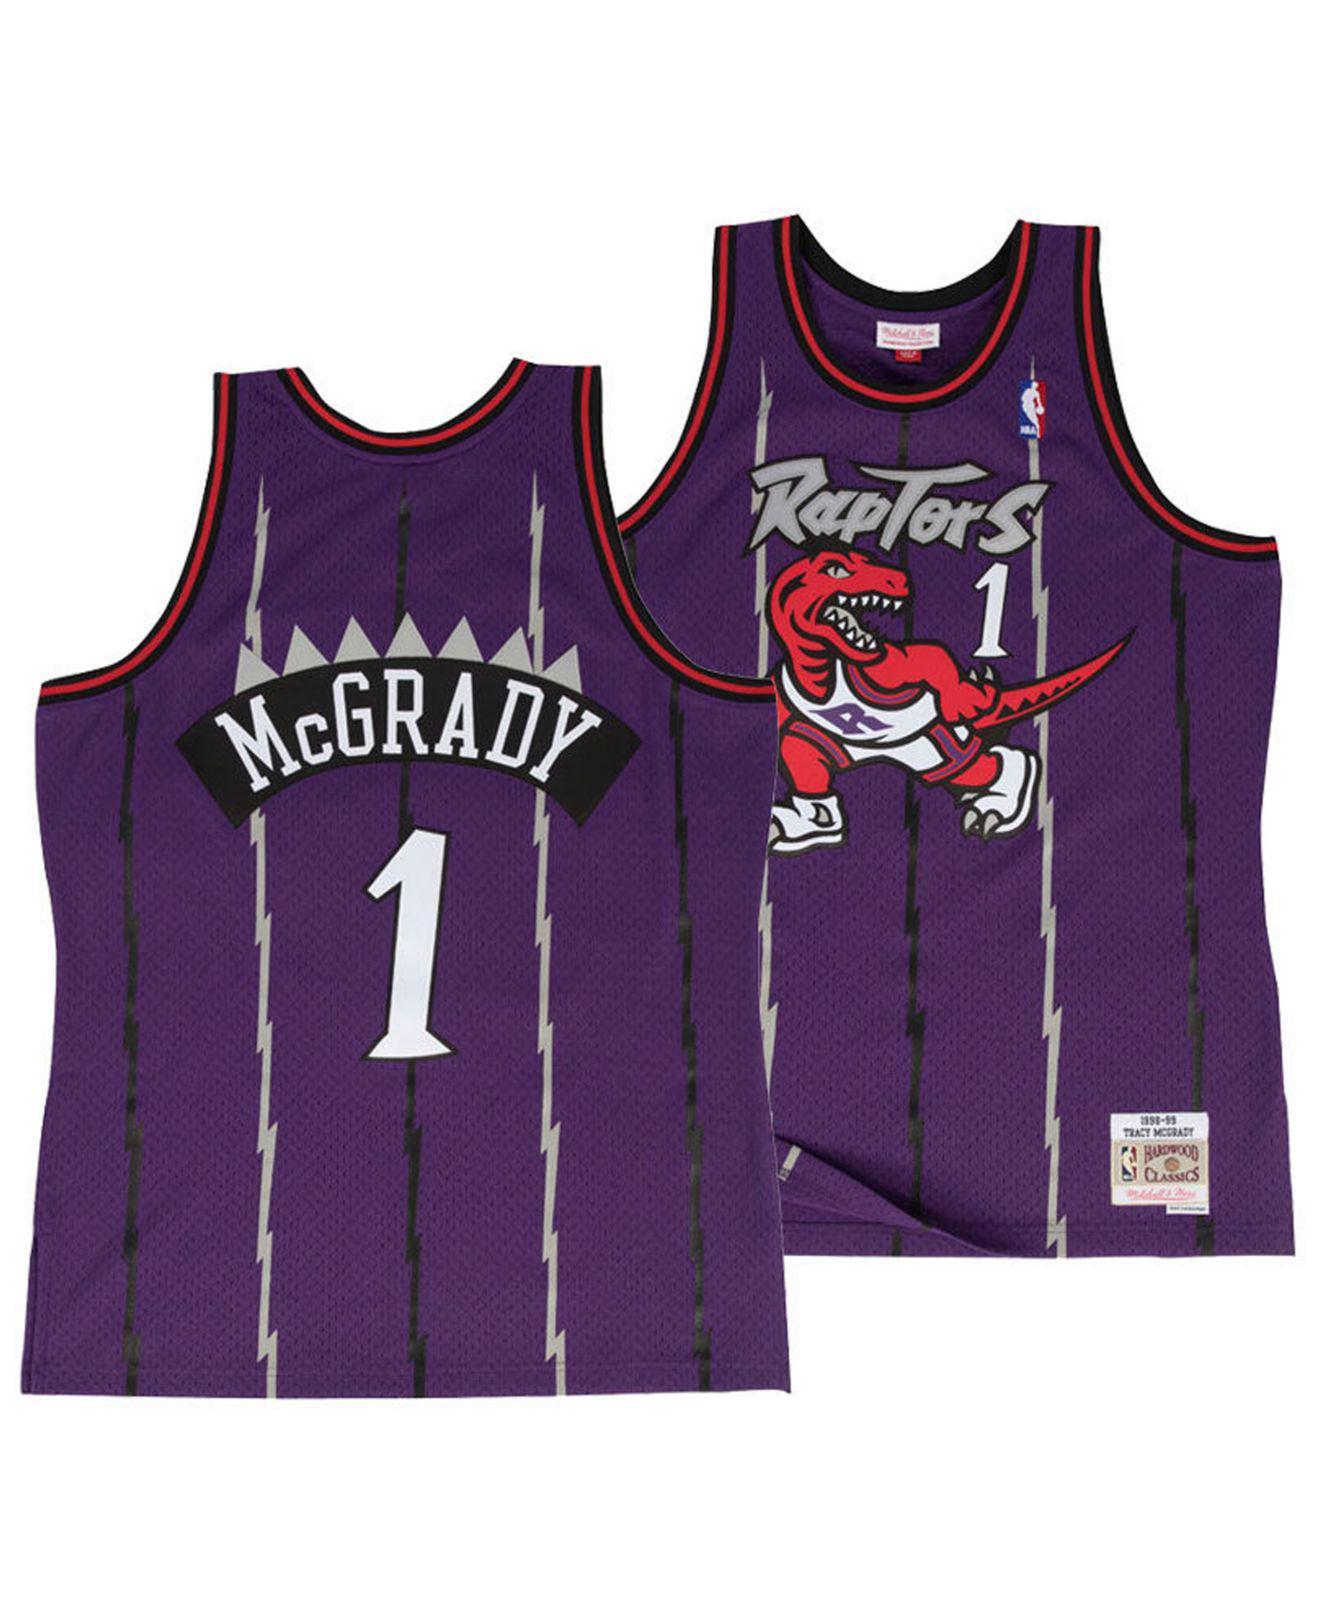 96151fe2d6a7 Mitchell   Ness. Men s Purple Tracy Mcgrady Toronto Raptors Hardwood  Classic Swingman Jersey